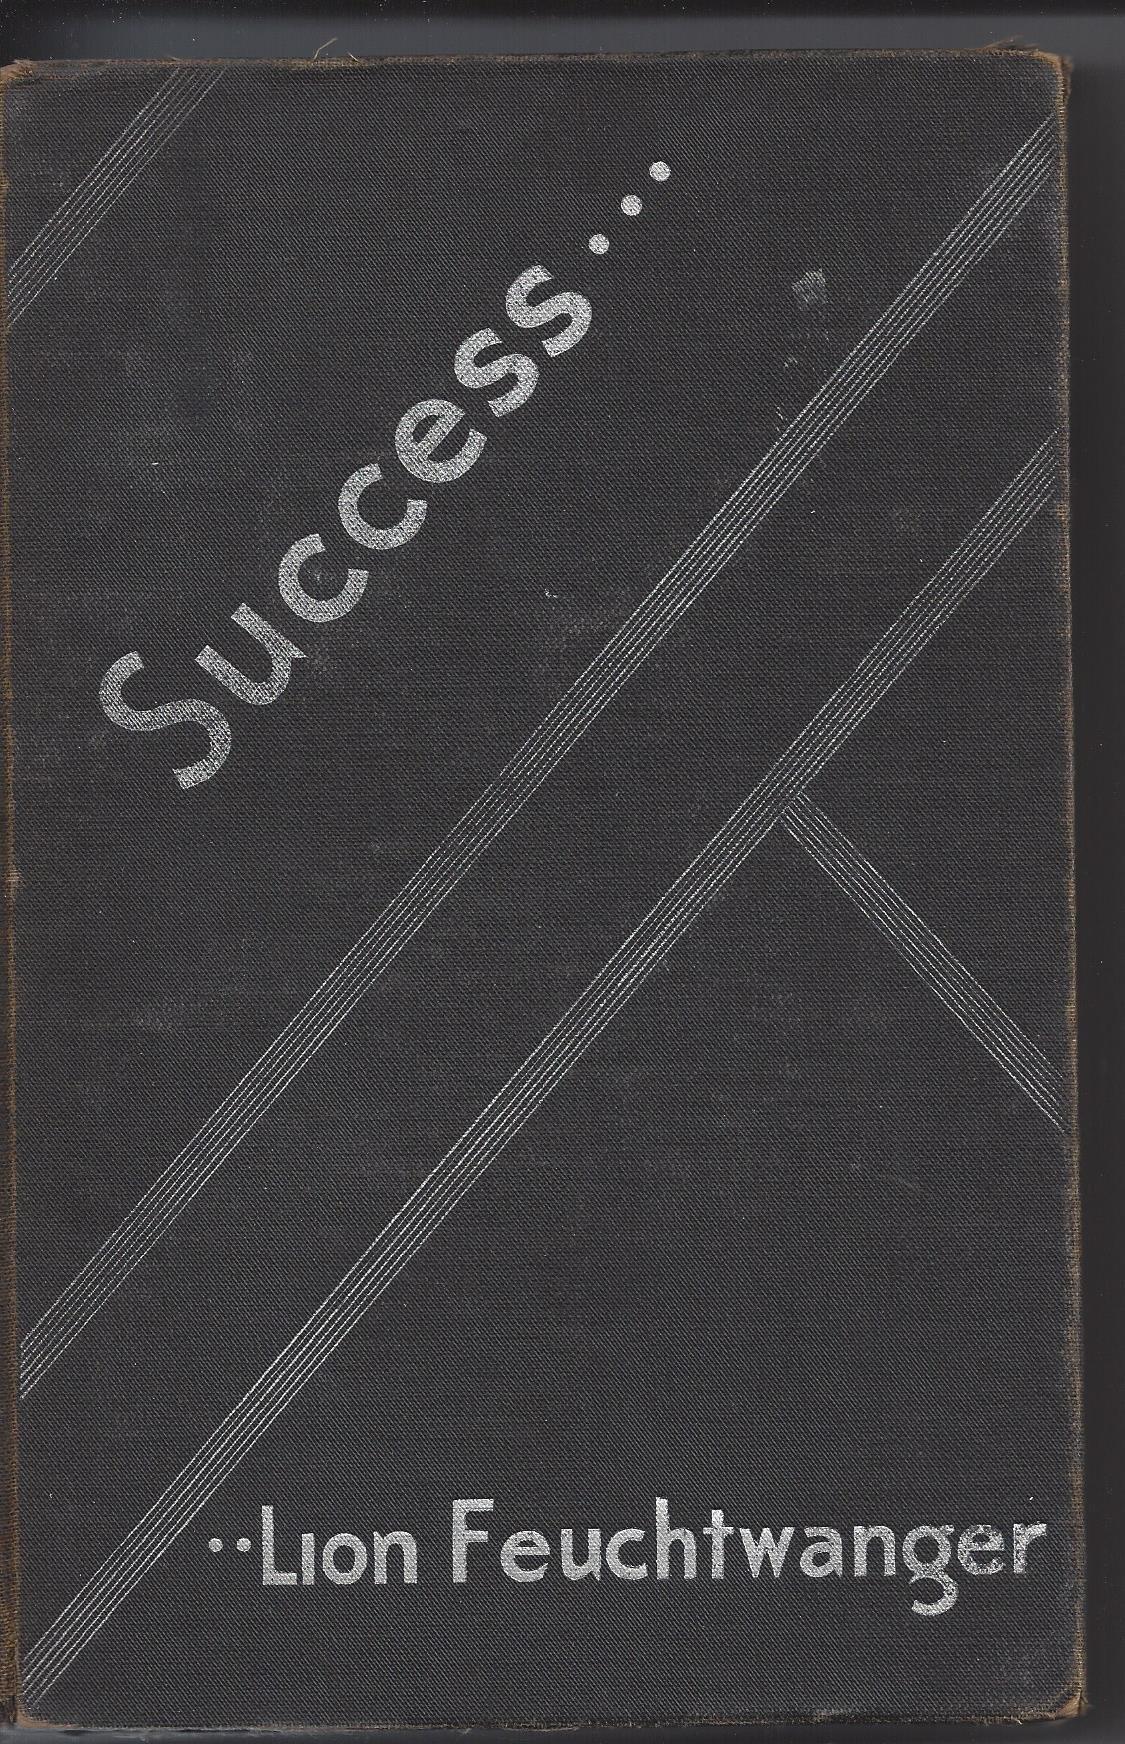 LION FEUCHTWANGER SUCCESS EBOOK DOWNLOAD